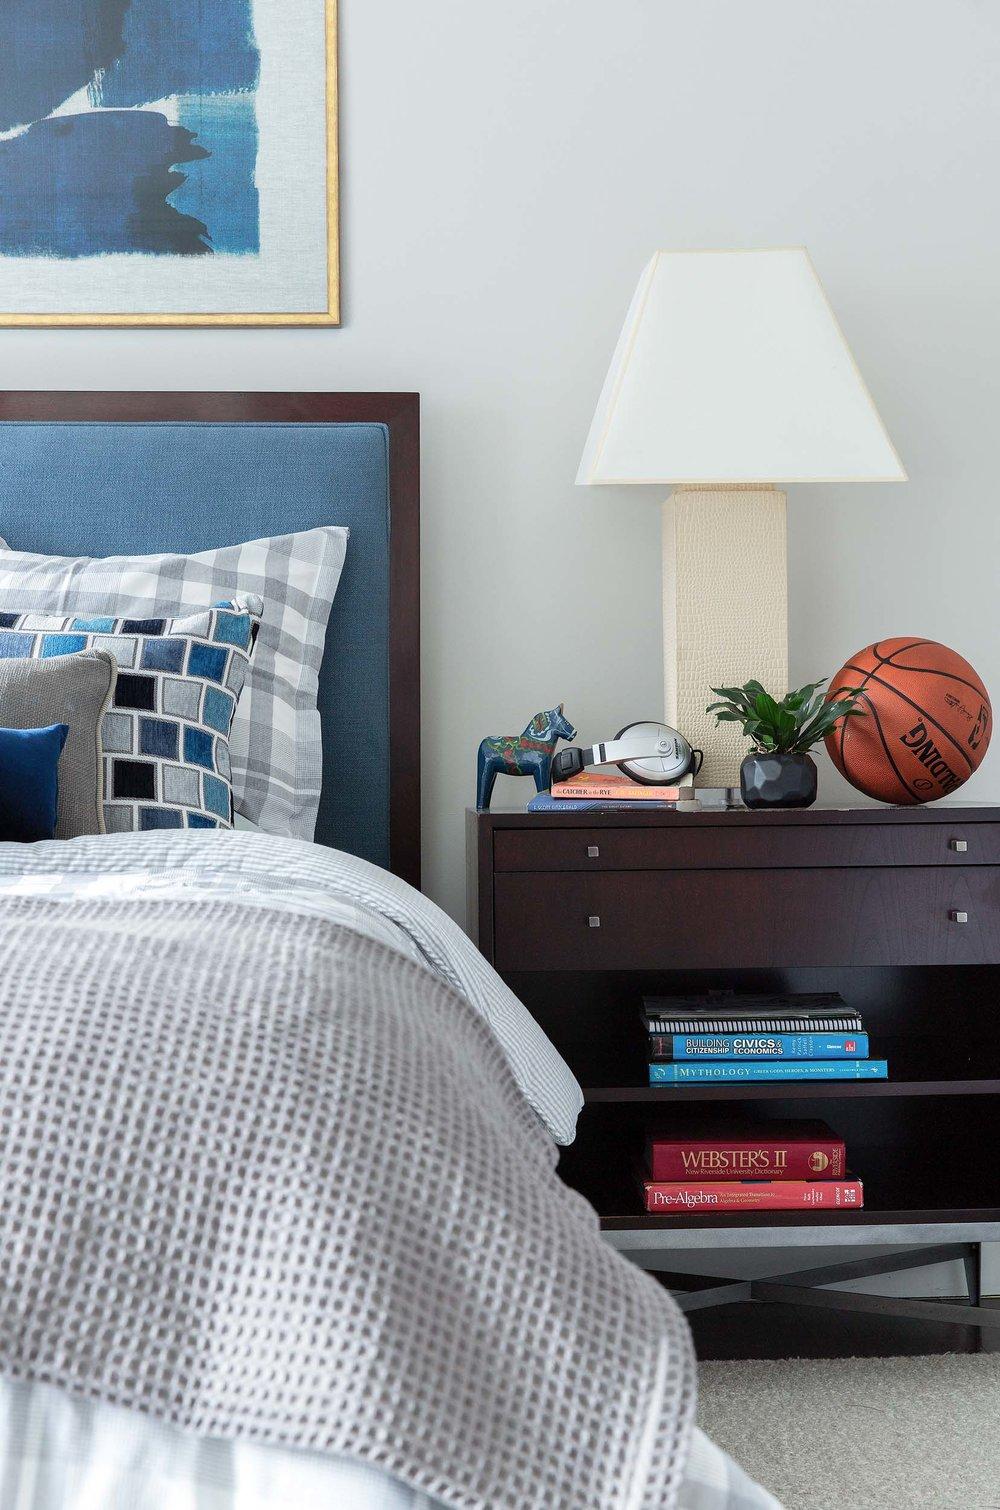 15-Casual-Elegant-Transitional-Contemporary-Top-boys-guest-bedroom-blue-headboard-ideas-Decorator-Best-Interior-Designers-Boston-South-End-Back-Bay-Cambridge-Dane-Austin-Design.jpg